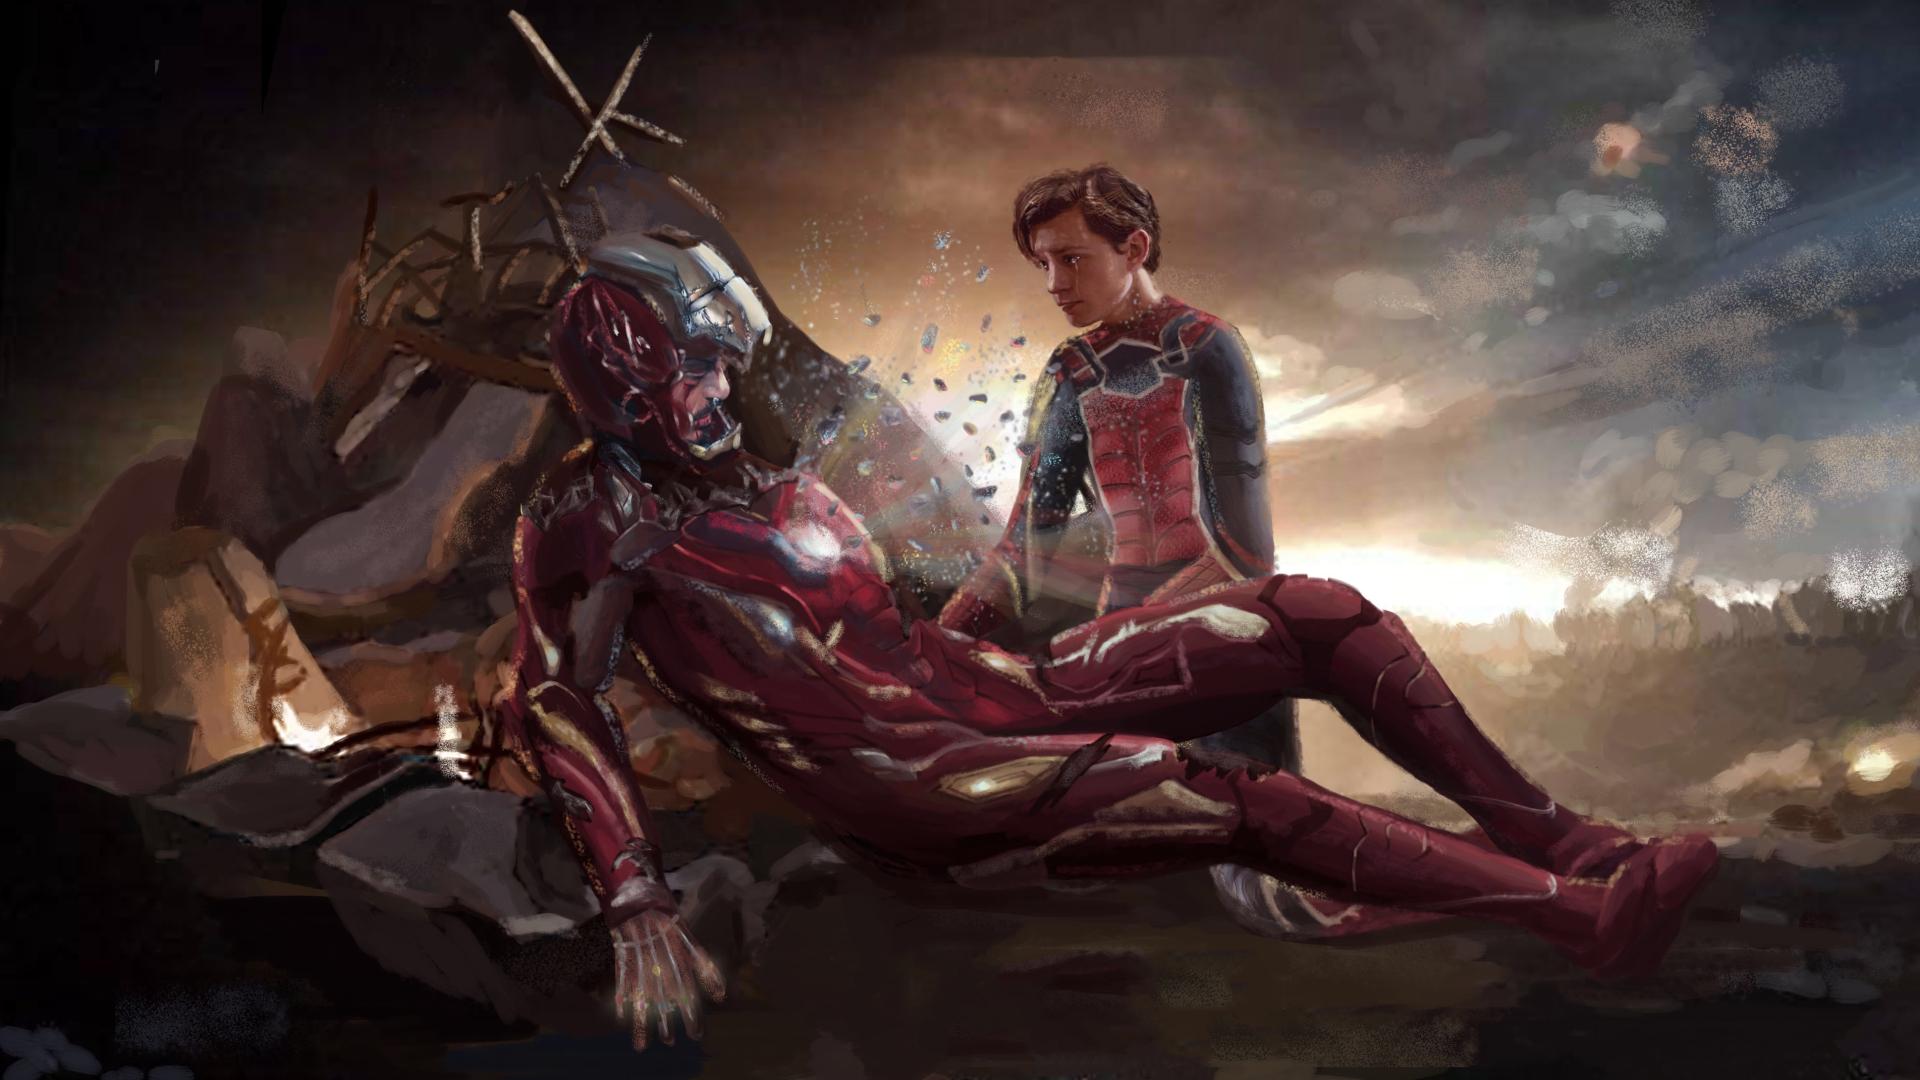 1920x1080 Iron Man And Spiderman Last Scene Art 1080p Laptop Full